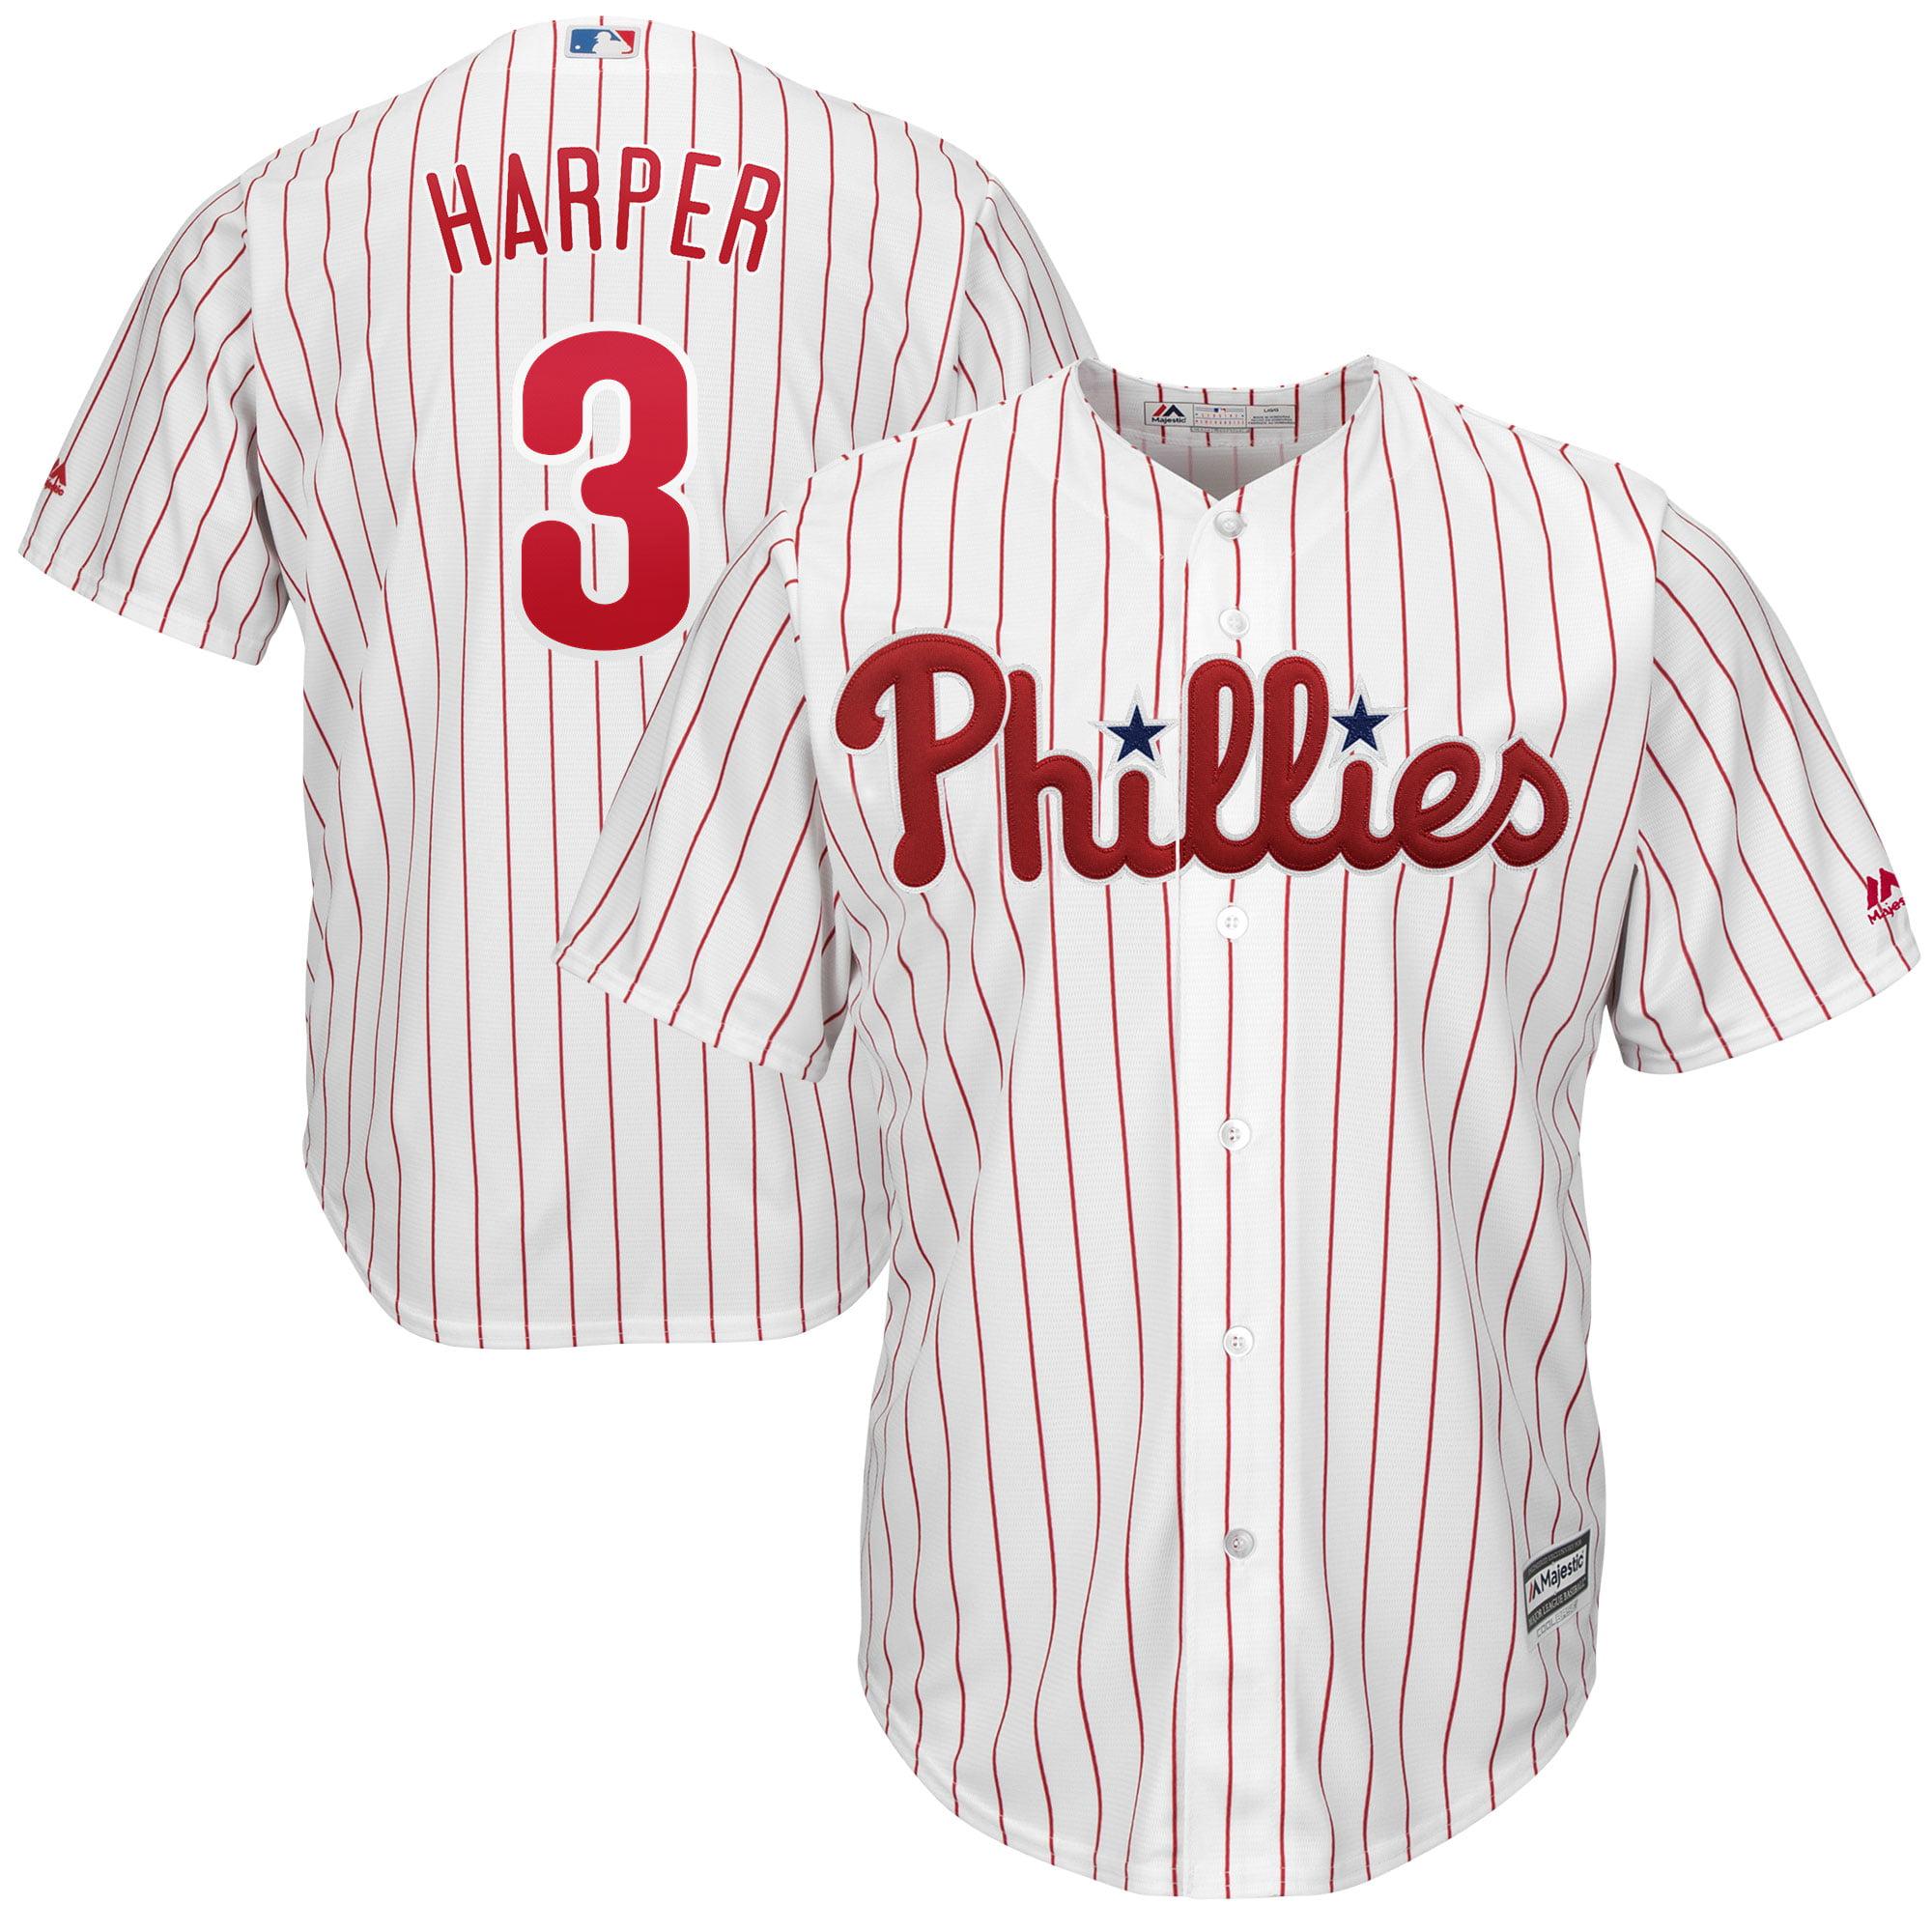 Bryce Harper Philadelphia Phillies Majestic Cool Base Players Choice Club Jersey - White - Walmart.com